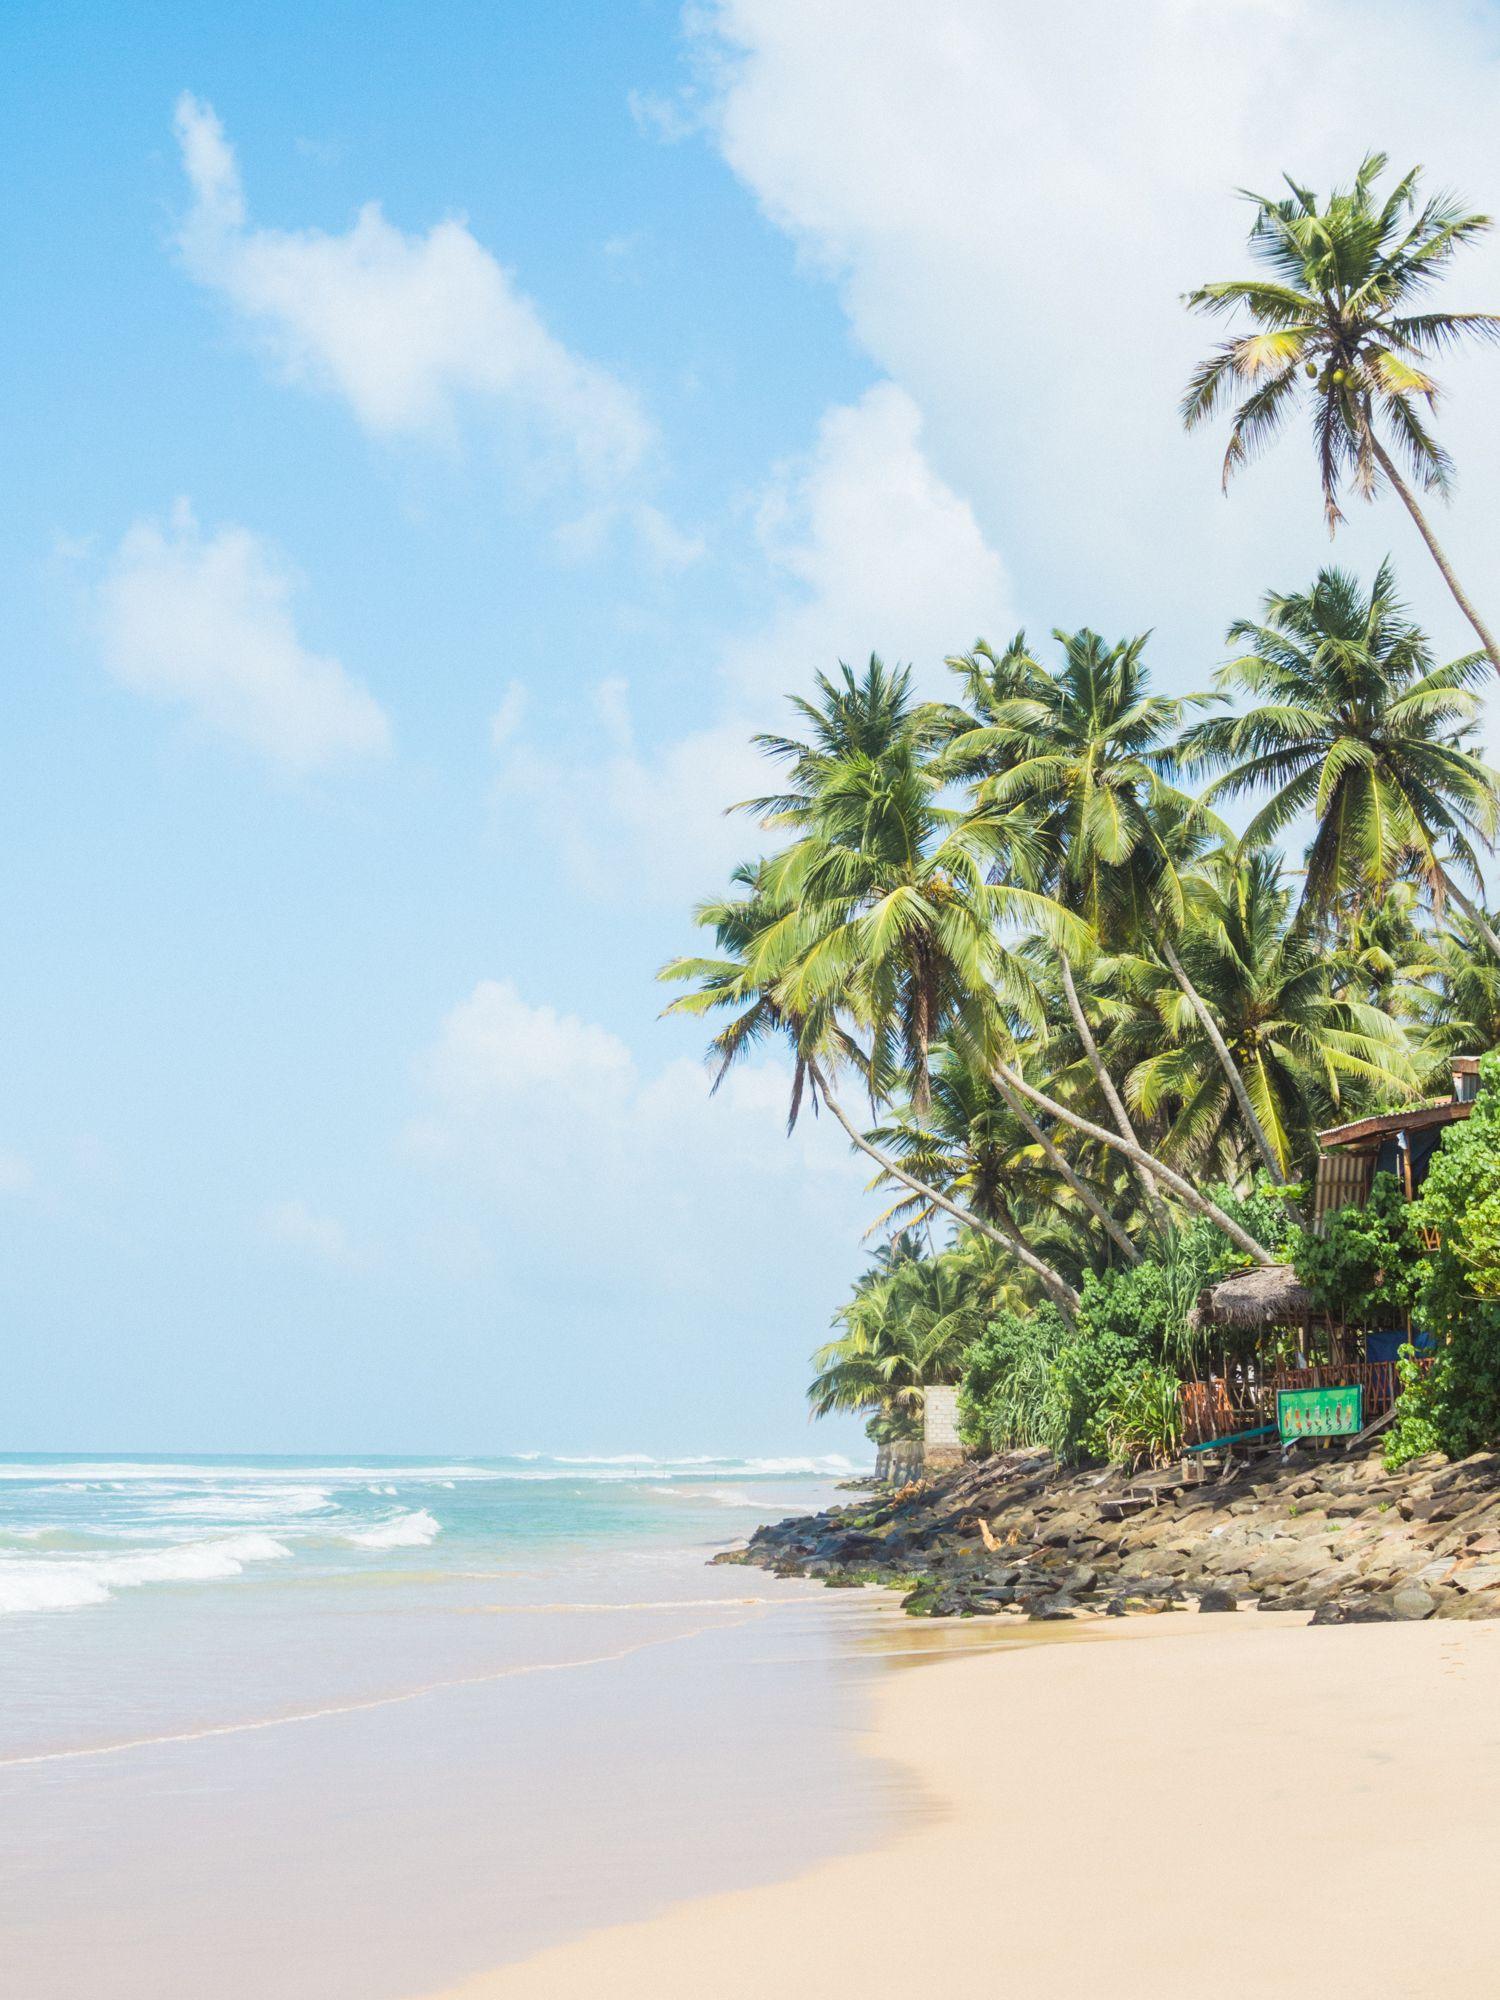 Tropical island life! Kabalana beach, Ahangama, Sri Lanka